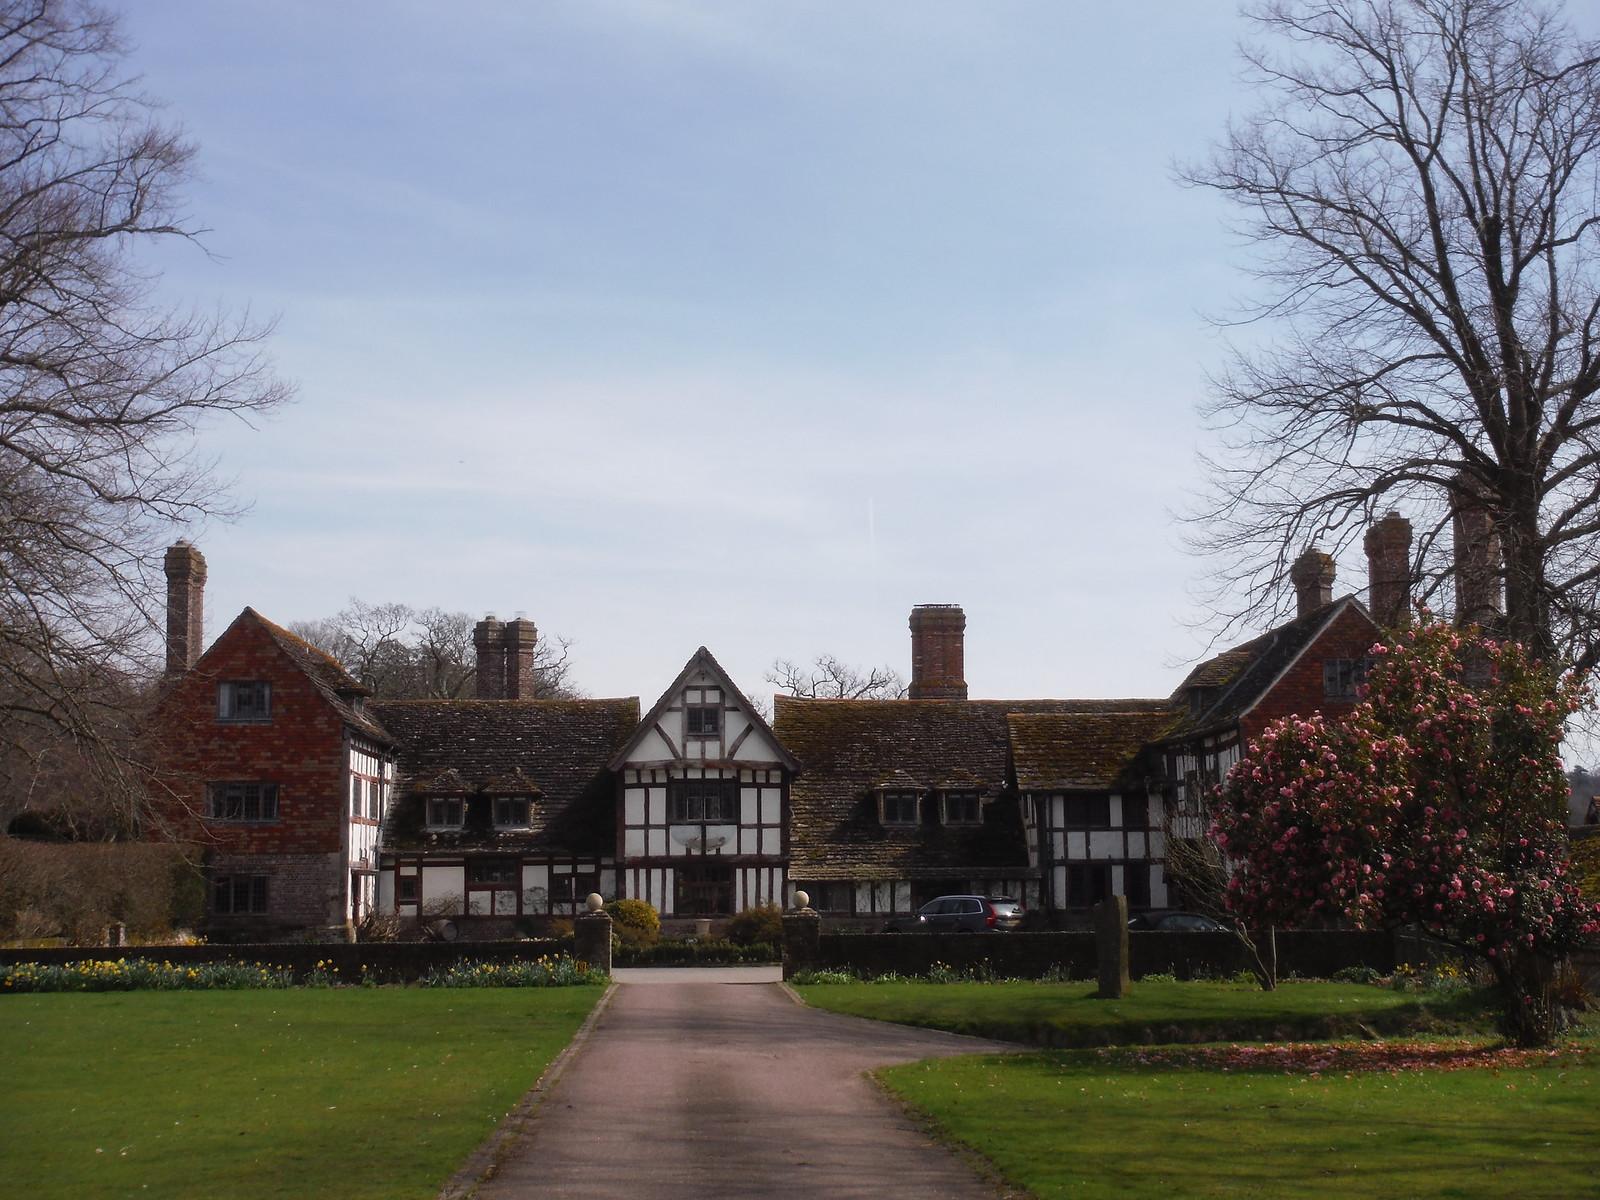 Broadhurst Manor SWC Walk 27 - East Grinstead to Wivelsfield or Sheffield Park